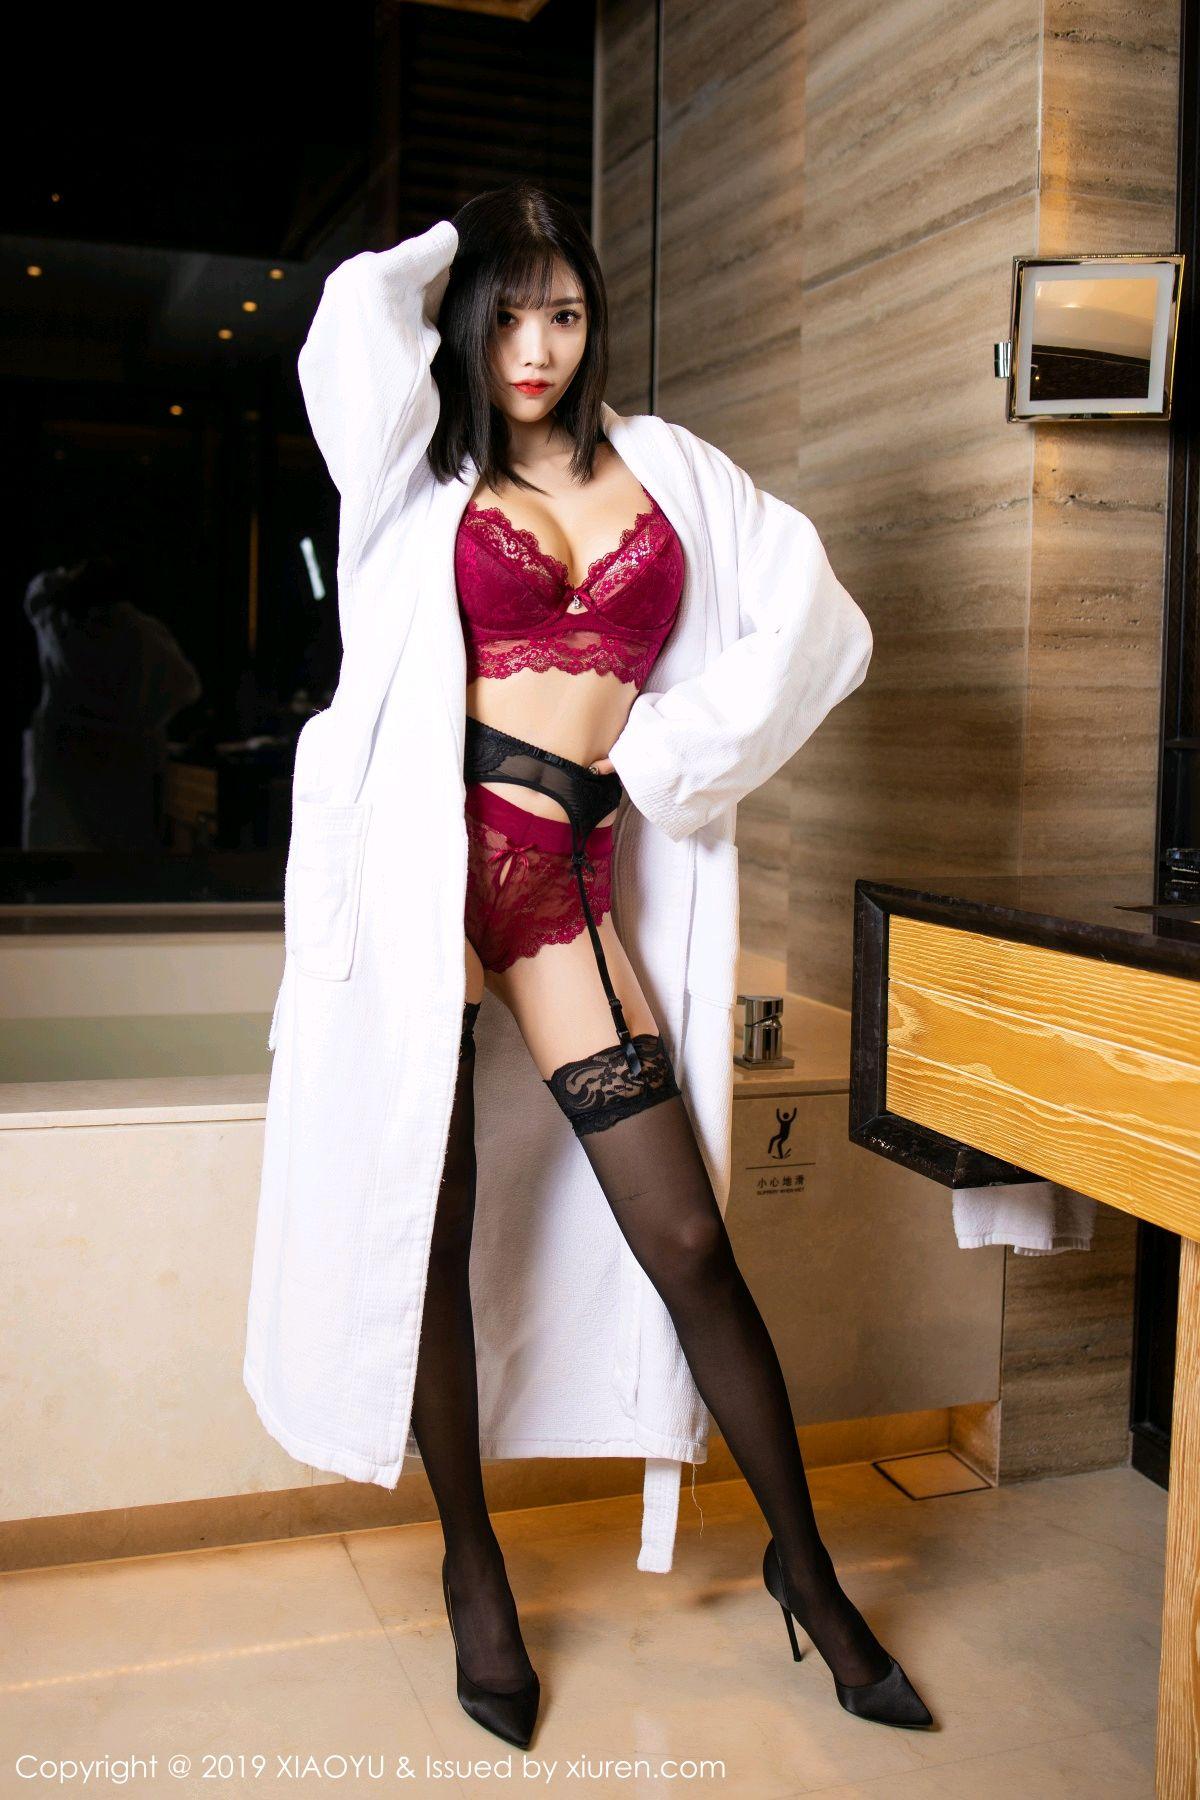 [XiaoYu] Vol.153 Yang Chen Chen 15P, Bathroom, Black Silk, Underwear, XiaoYu, Yang Chen Chen